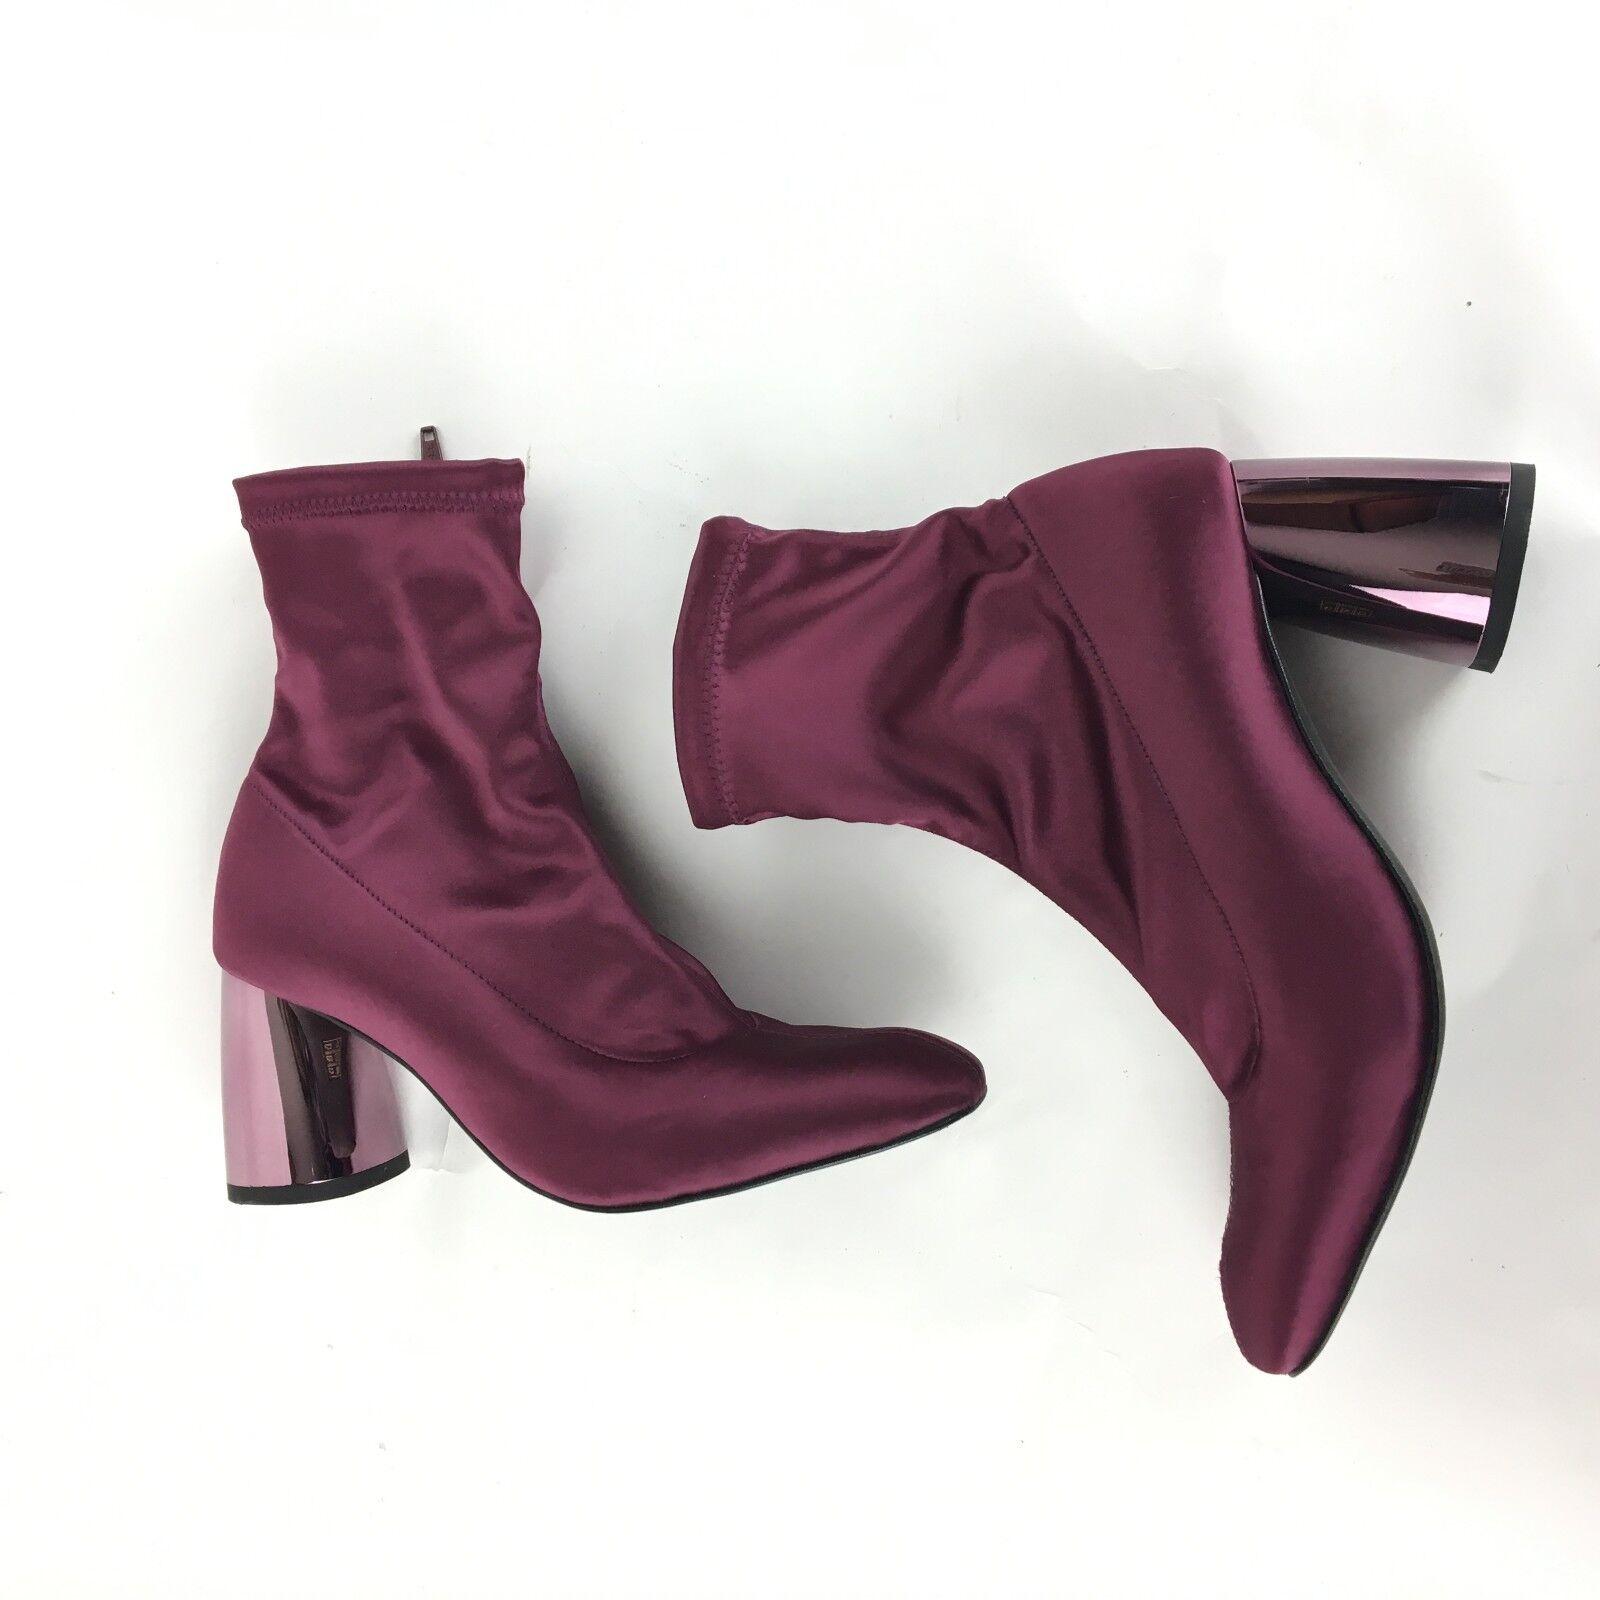 New Free People Spectrum Sock Boot Purple Ankle Boot Casual Größe 38 198